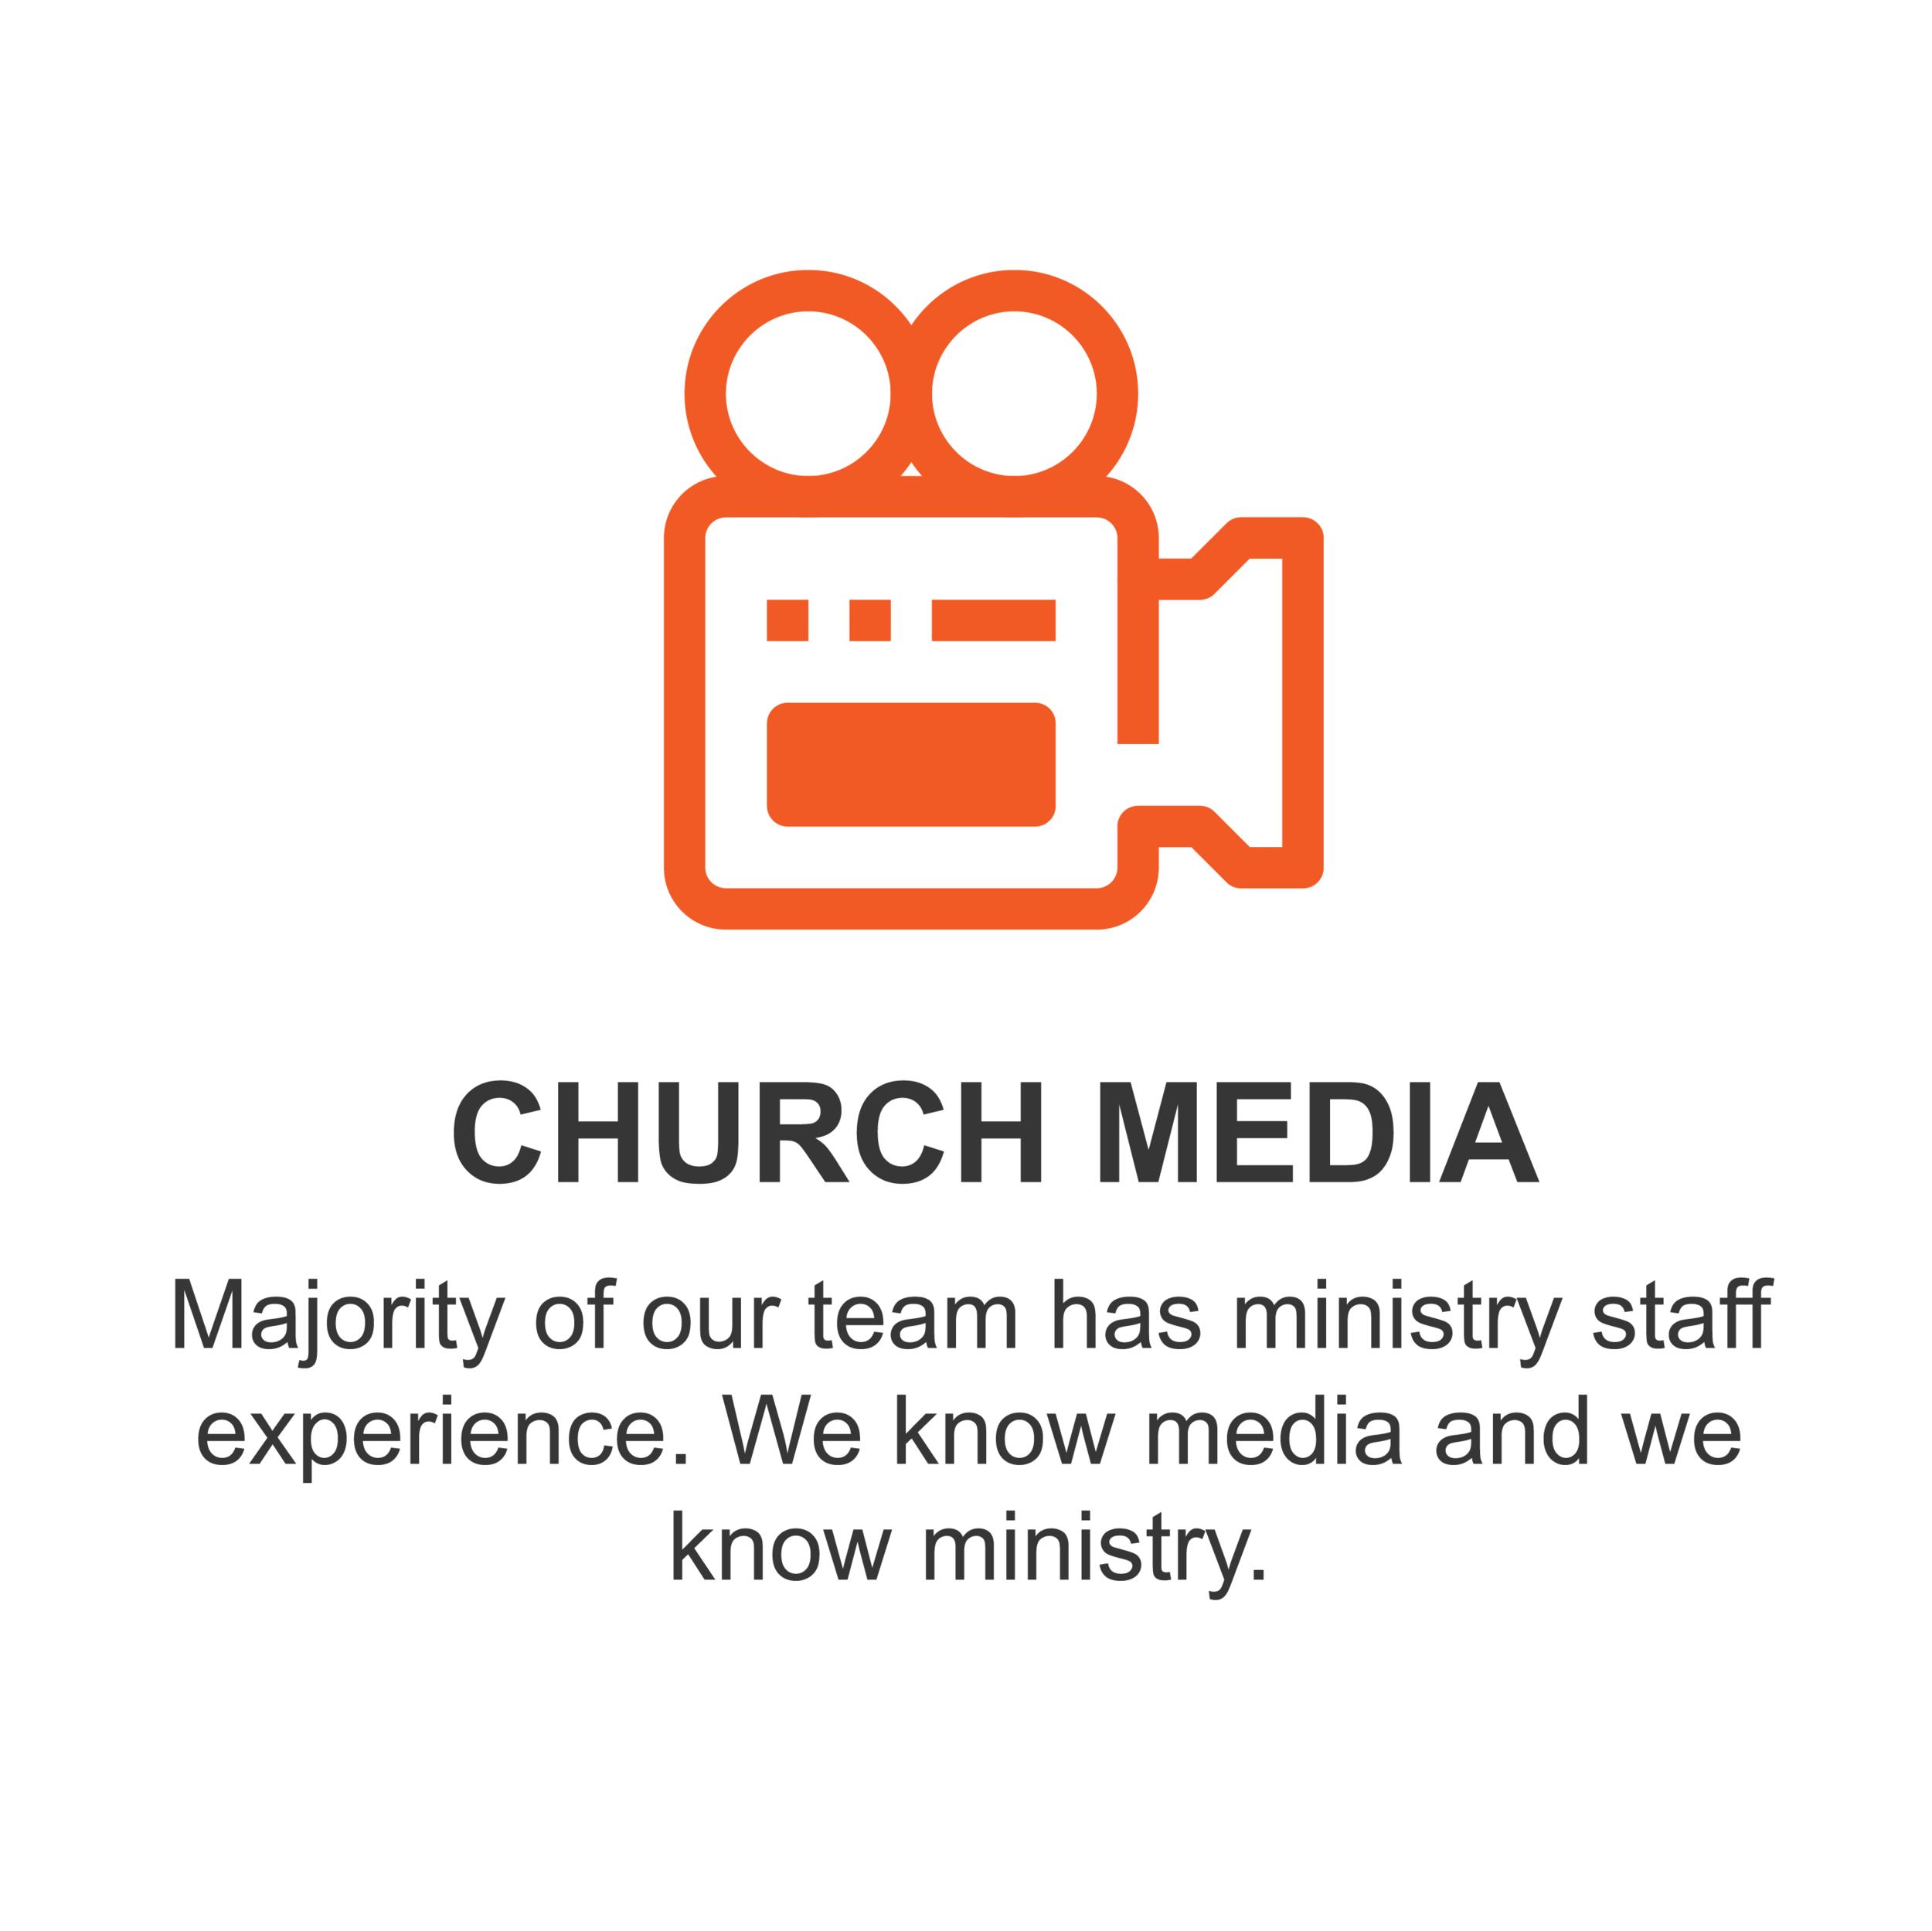 Churchmediaicon.png